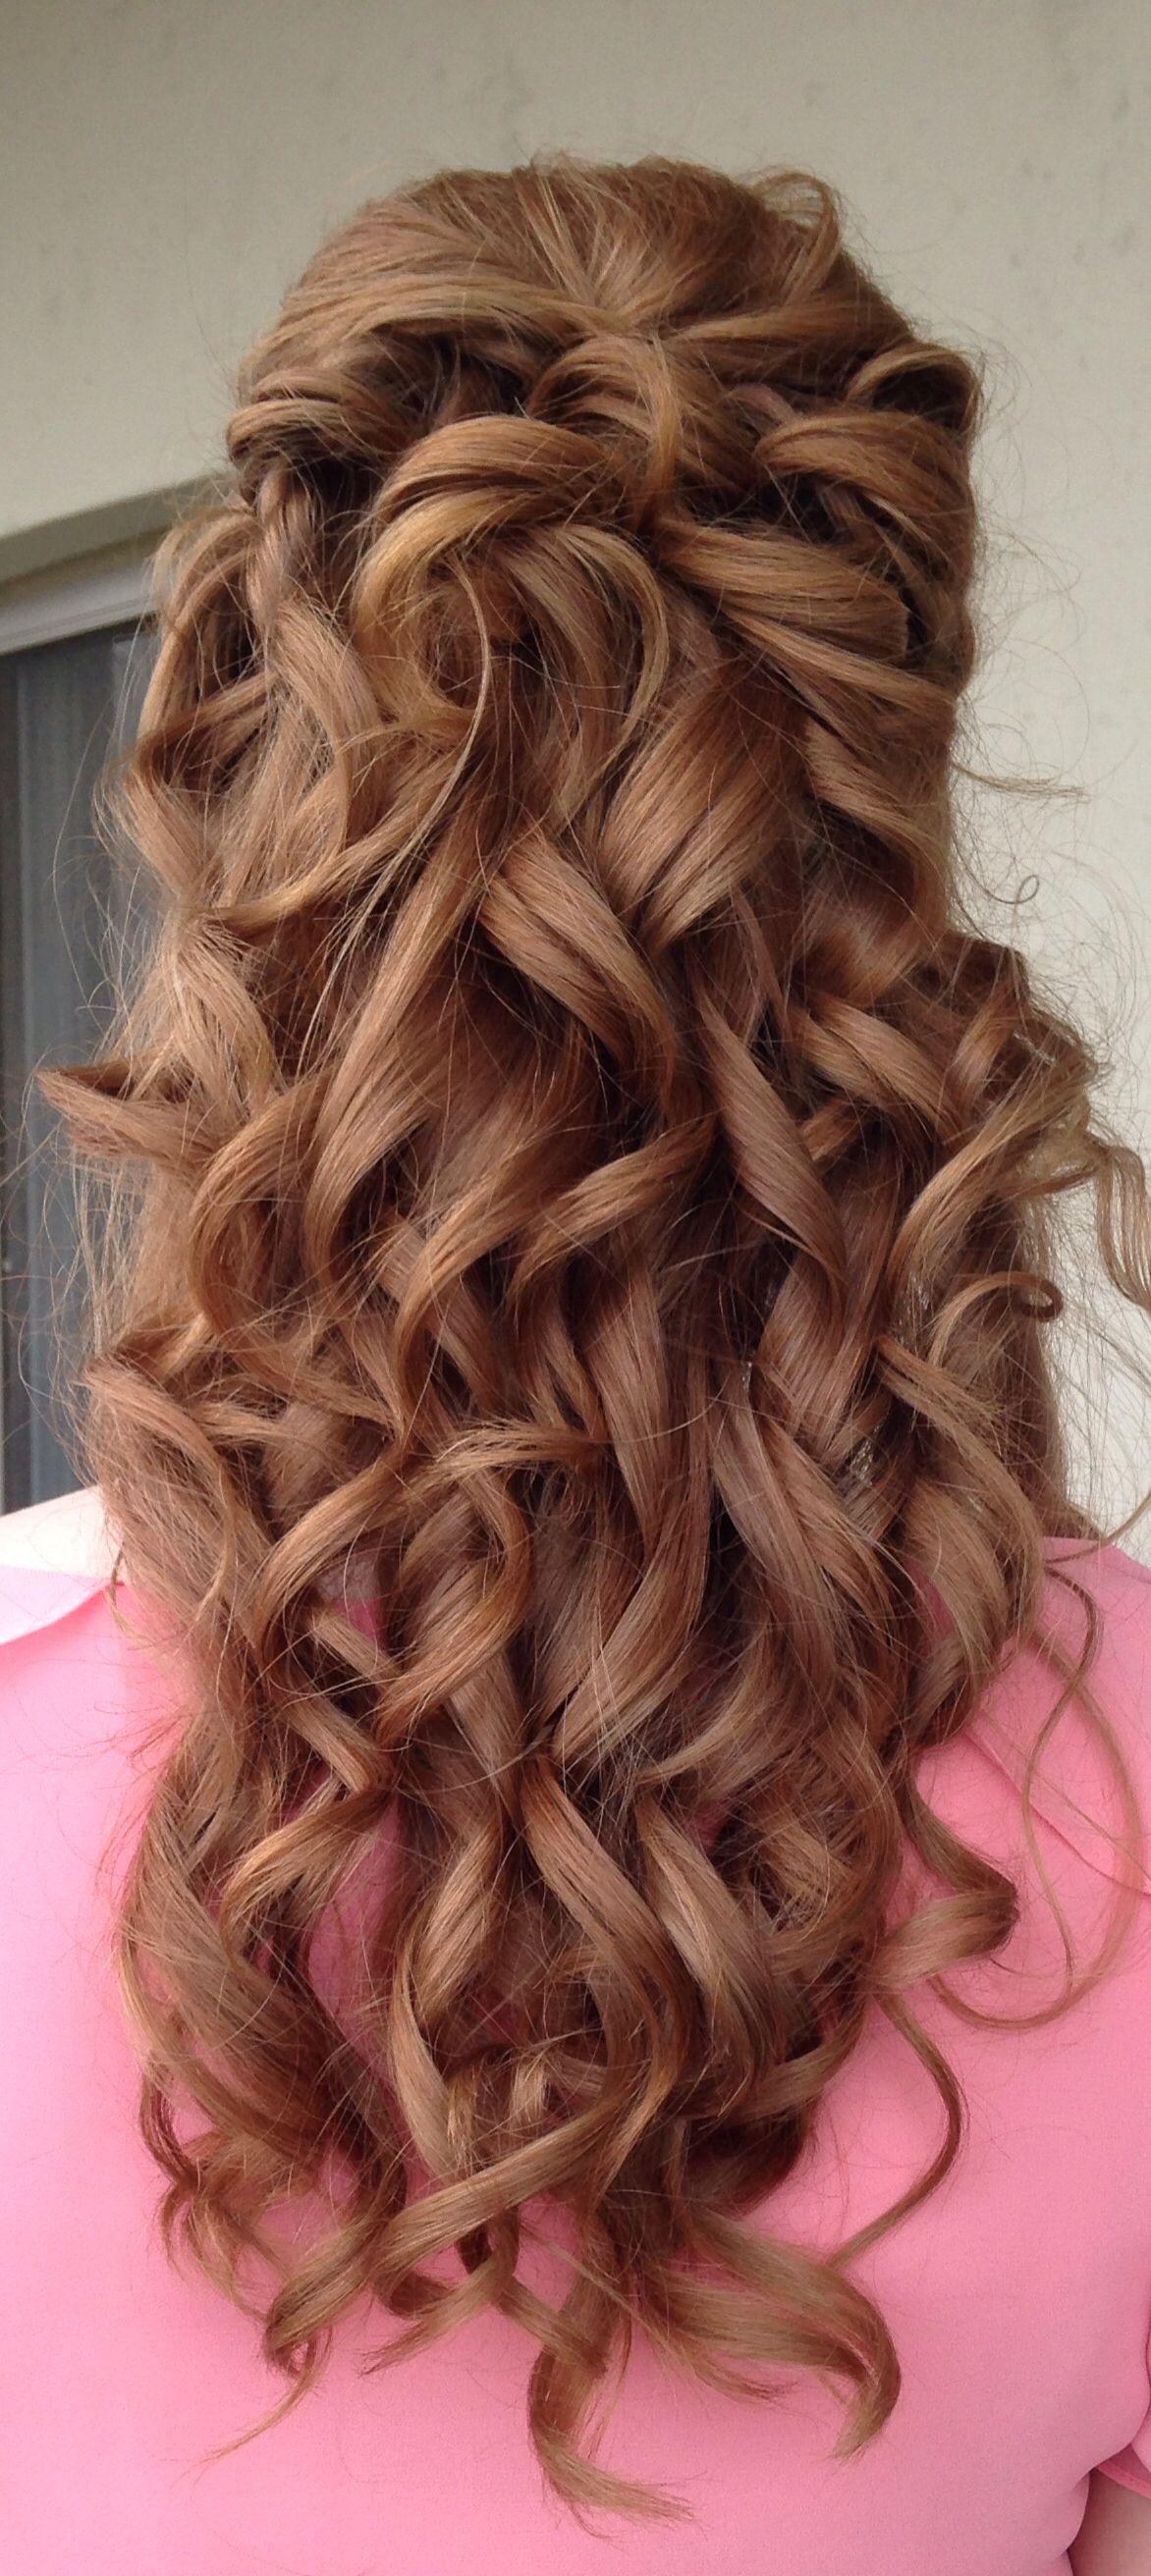 bridalshower bridal shower updo curls half-up updo upstyle